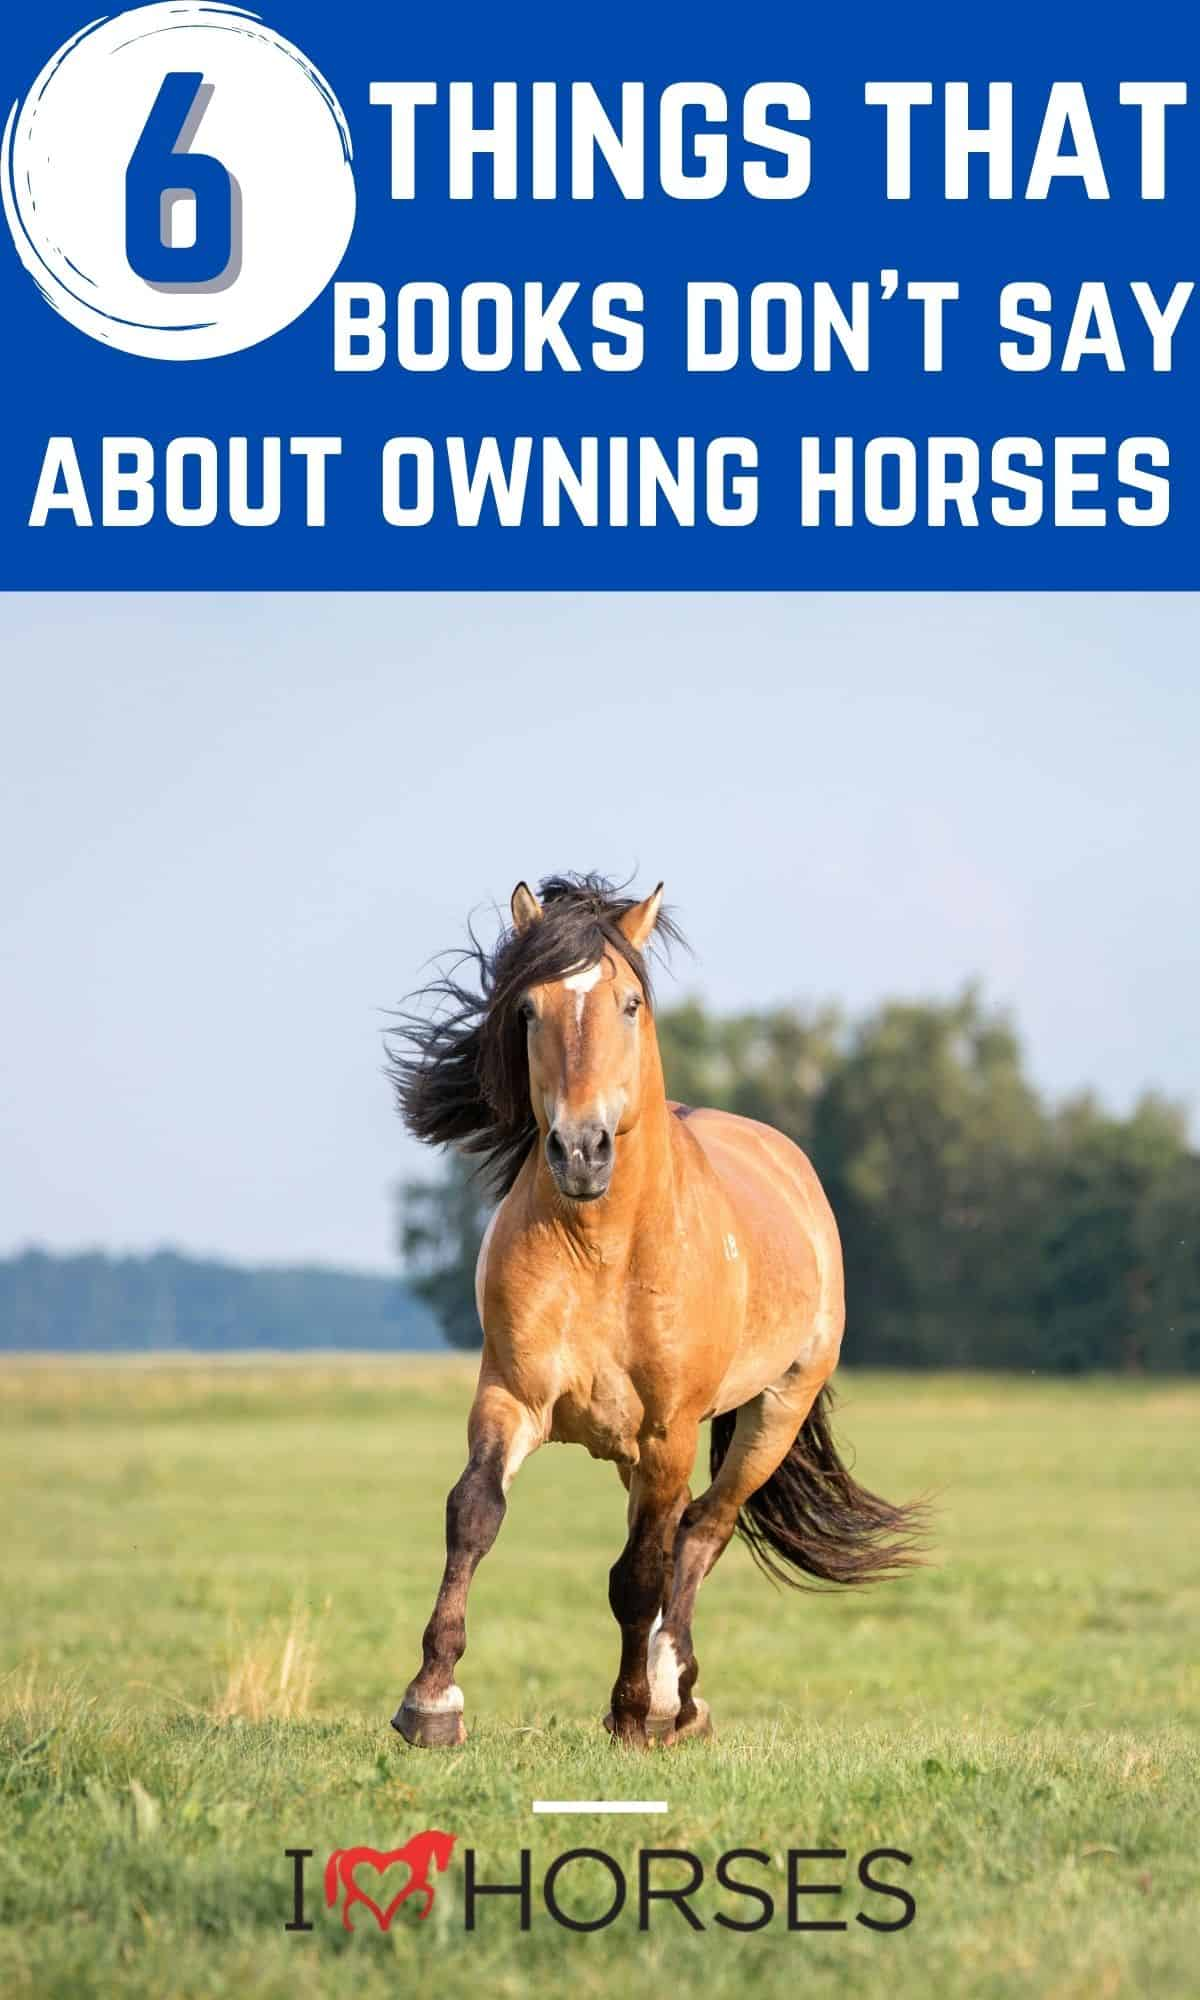 Tan horse running in field